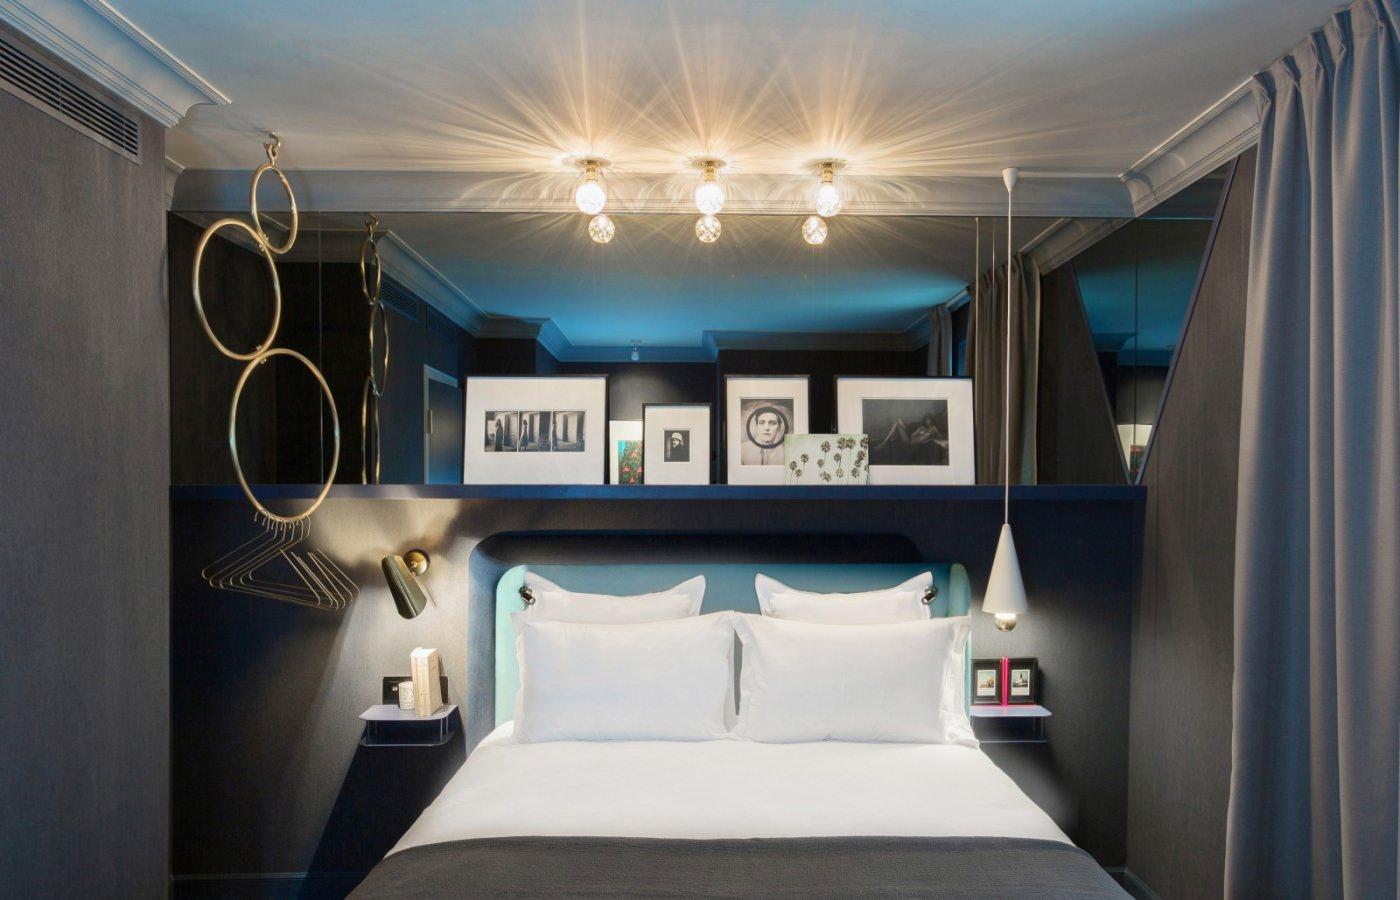 bob hotel by elegancia sur h tel paris. Black Bedroom Furniture Sets. Home Design Ideas